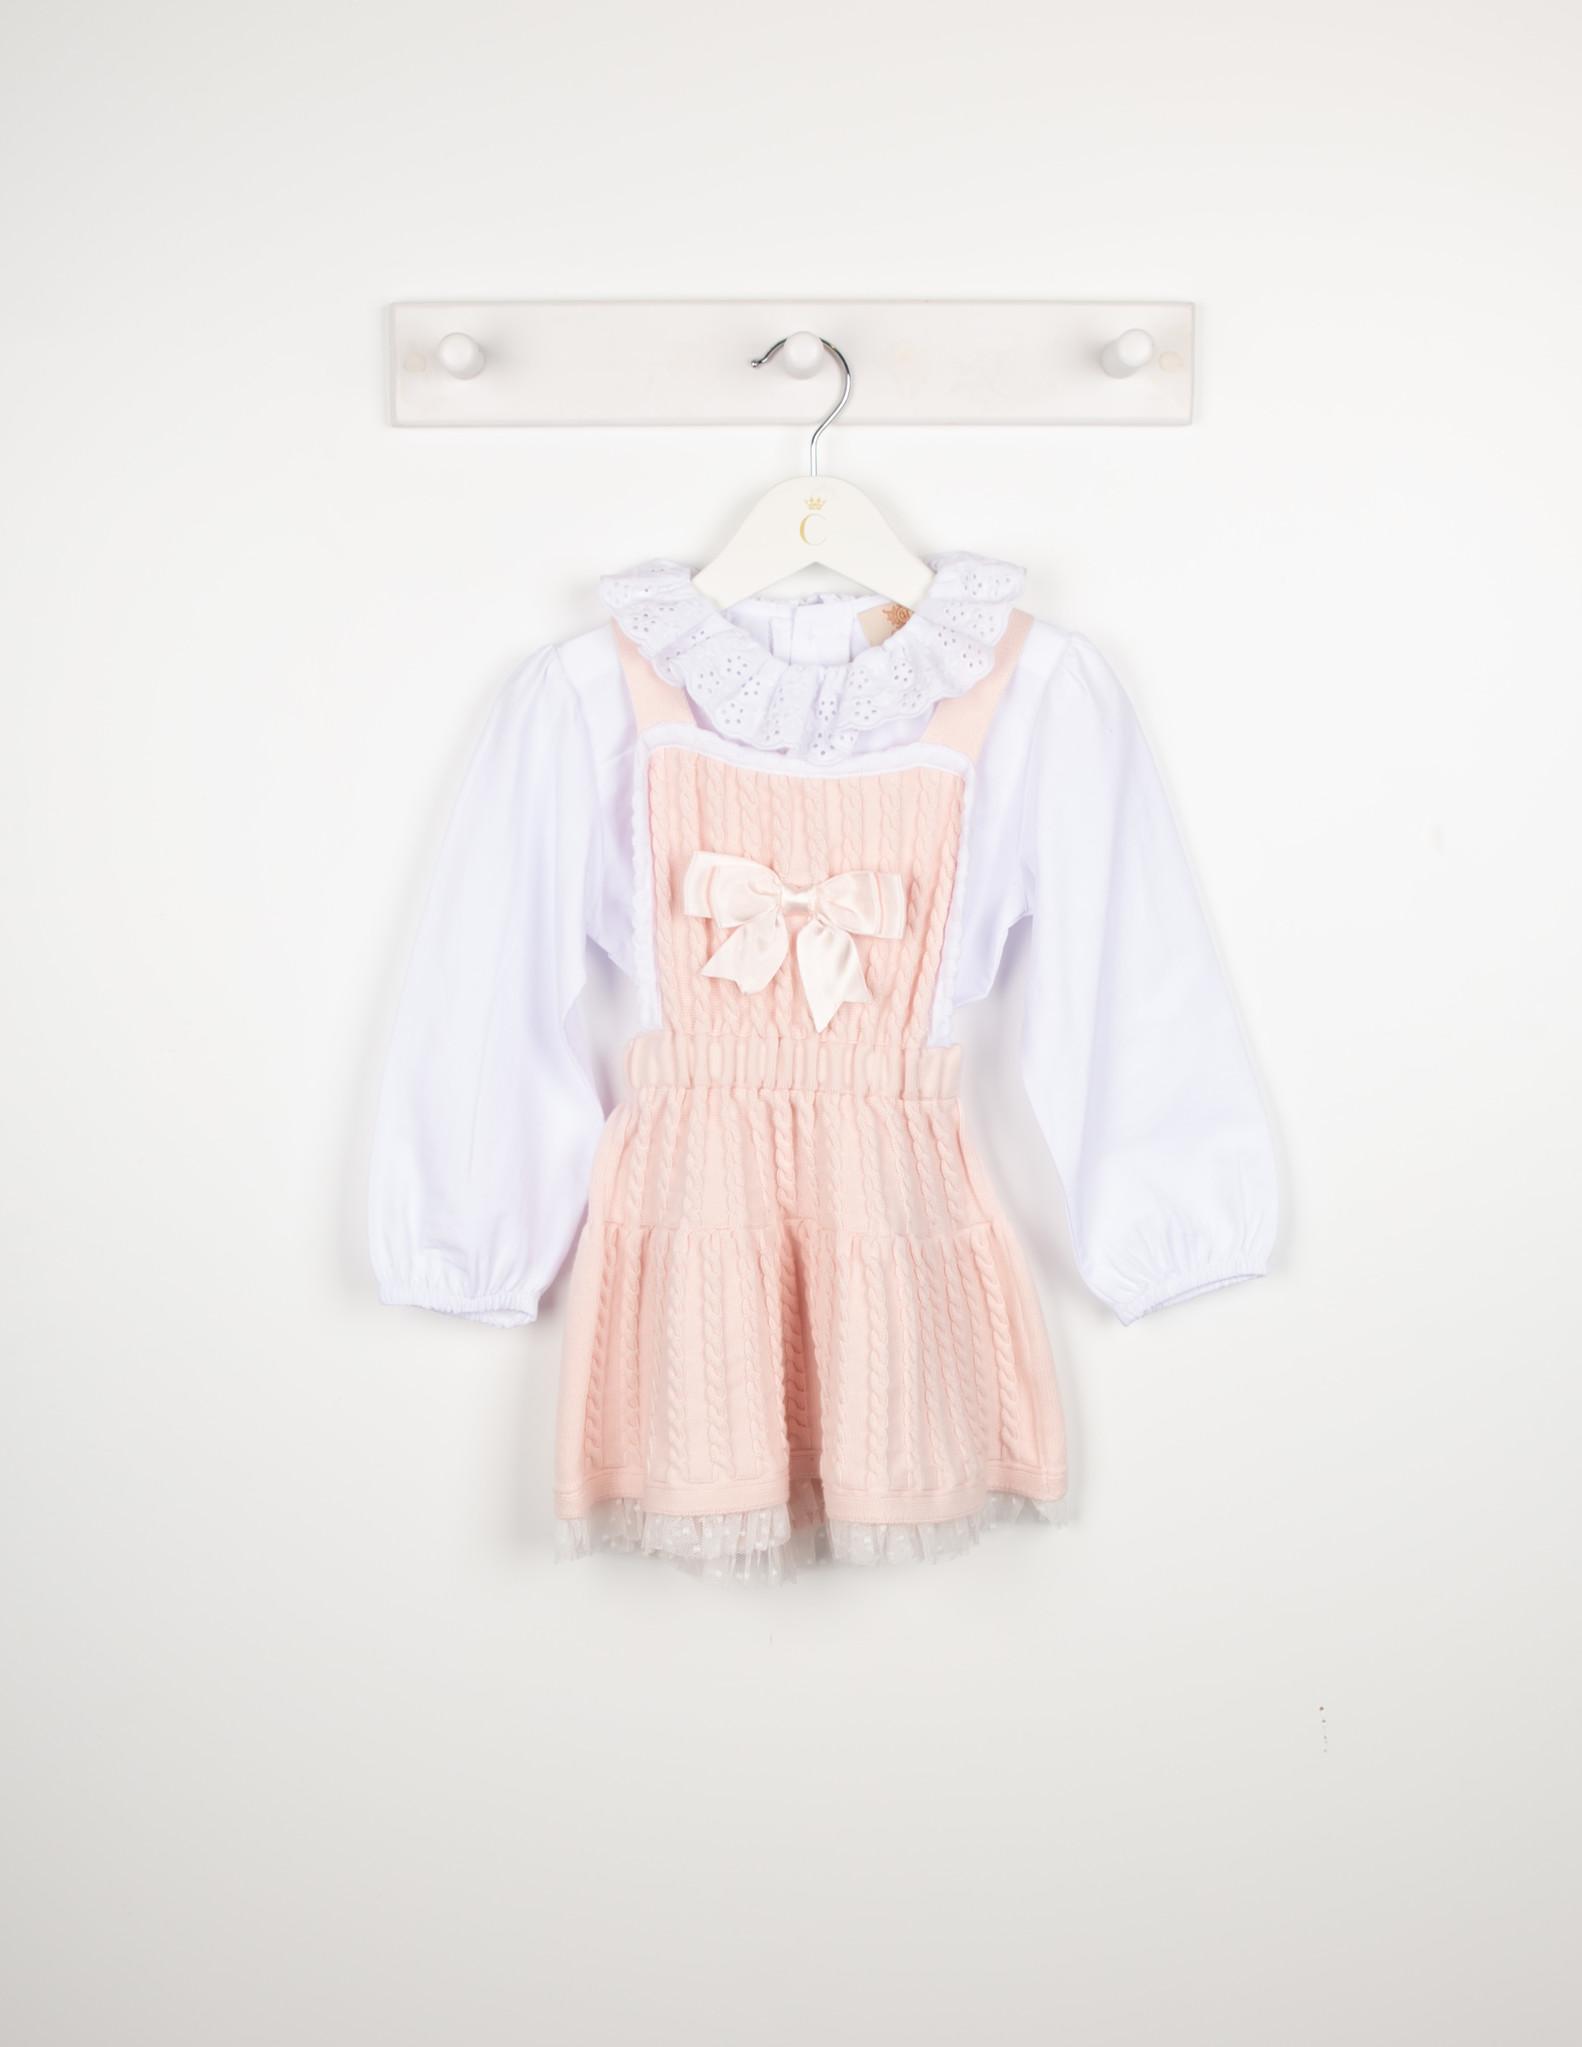 Caramelo Caramelo Pink Pinafore Dress - 201571 AW21